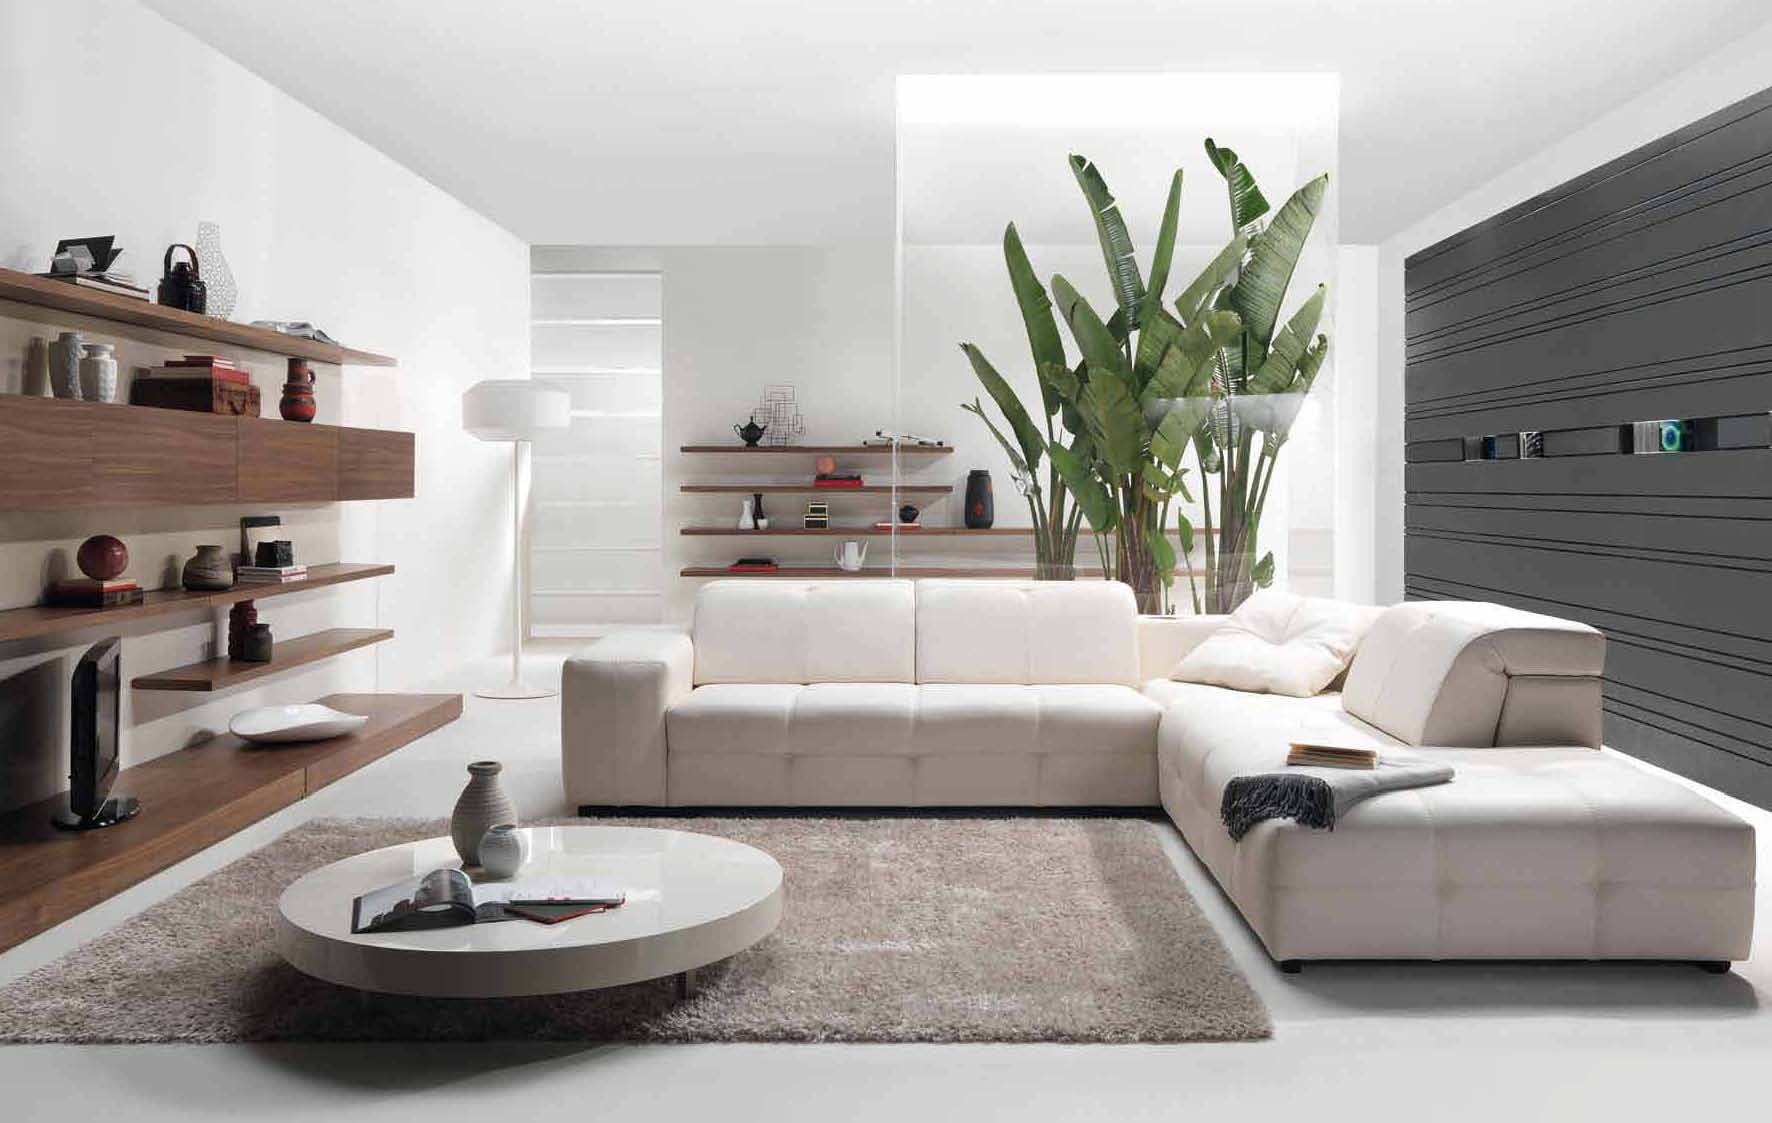 Modern Interior Design Ideas 8654 Hd Wallpapers in Architecture 1772x1123